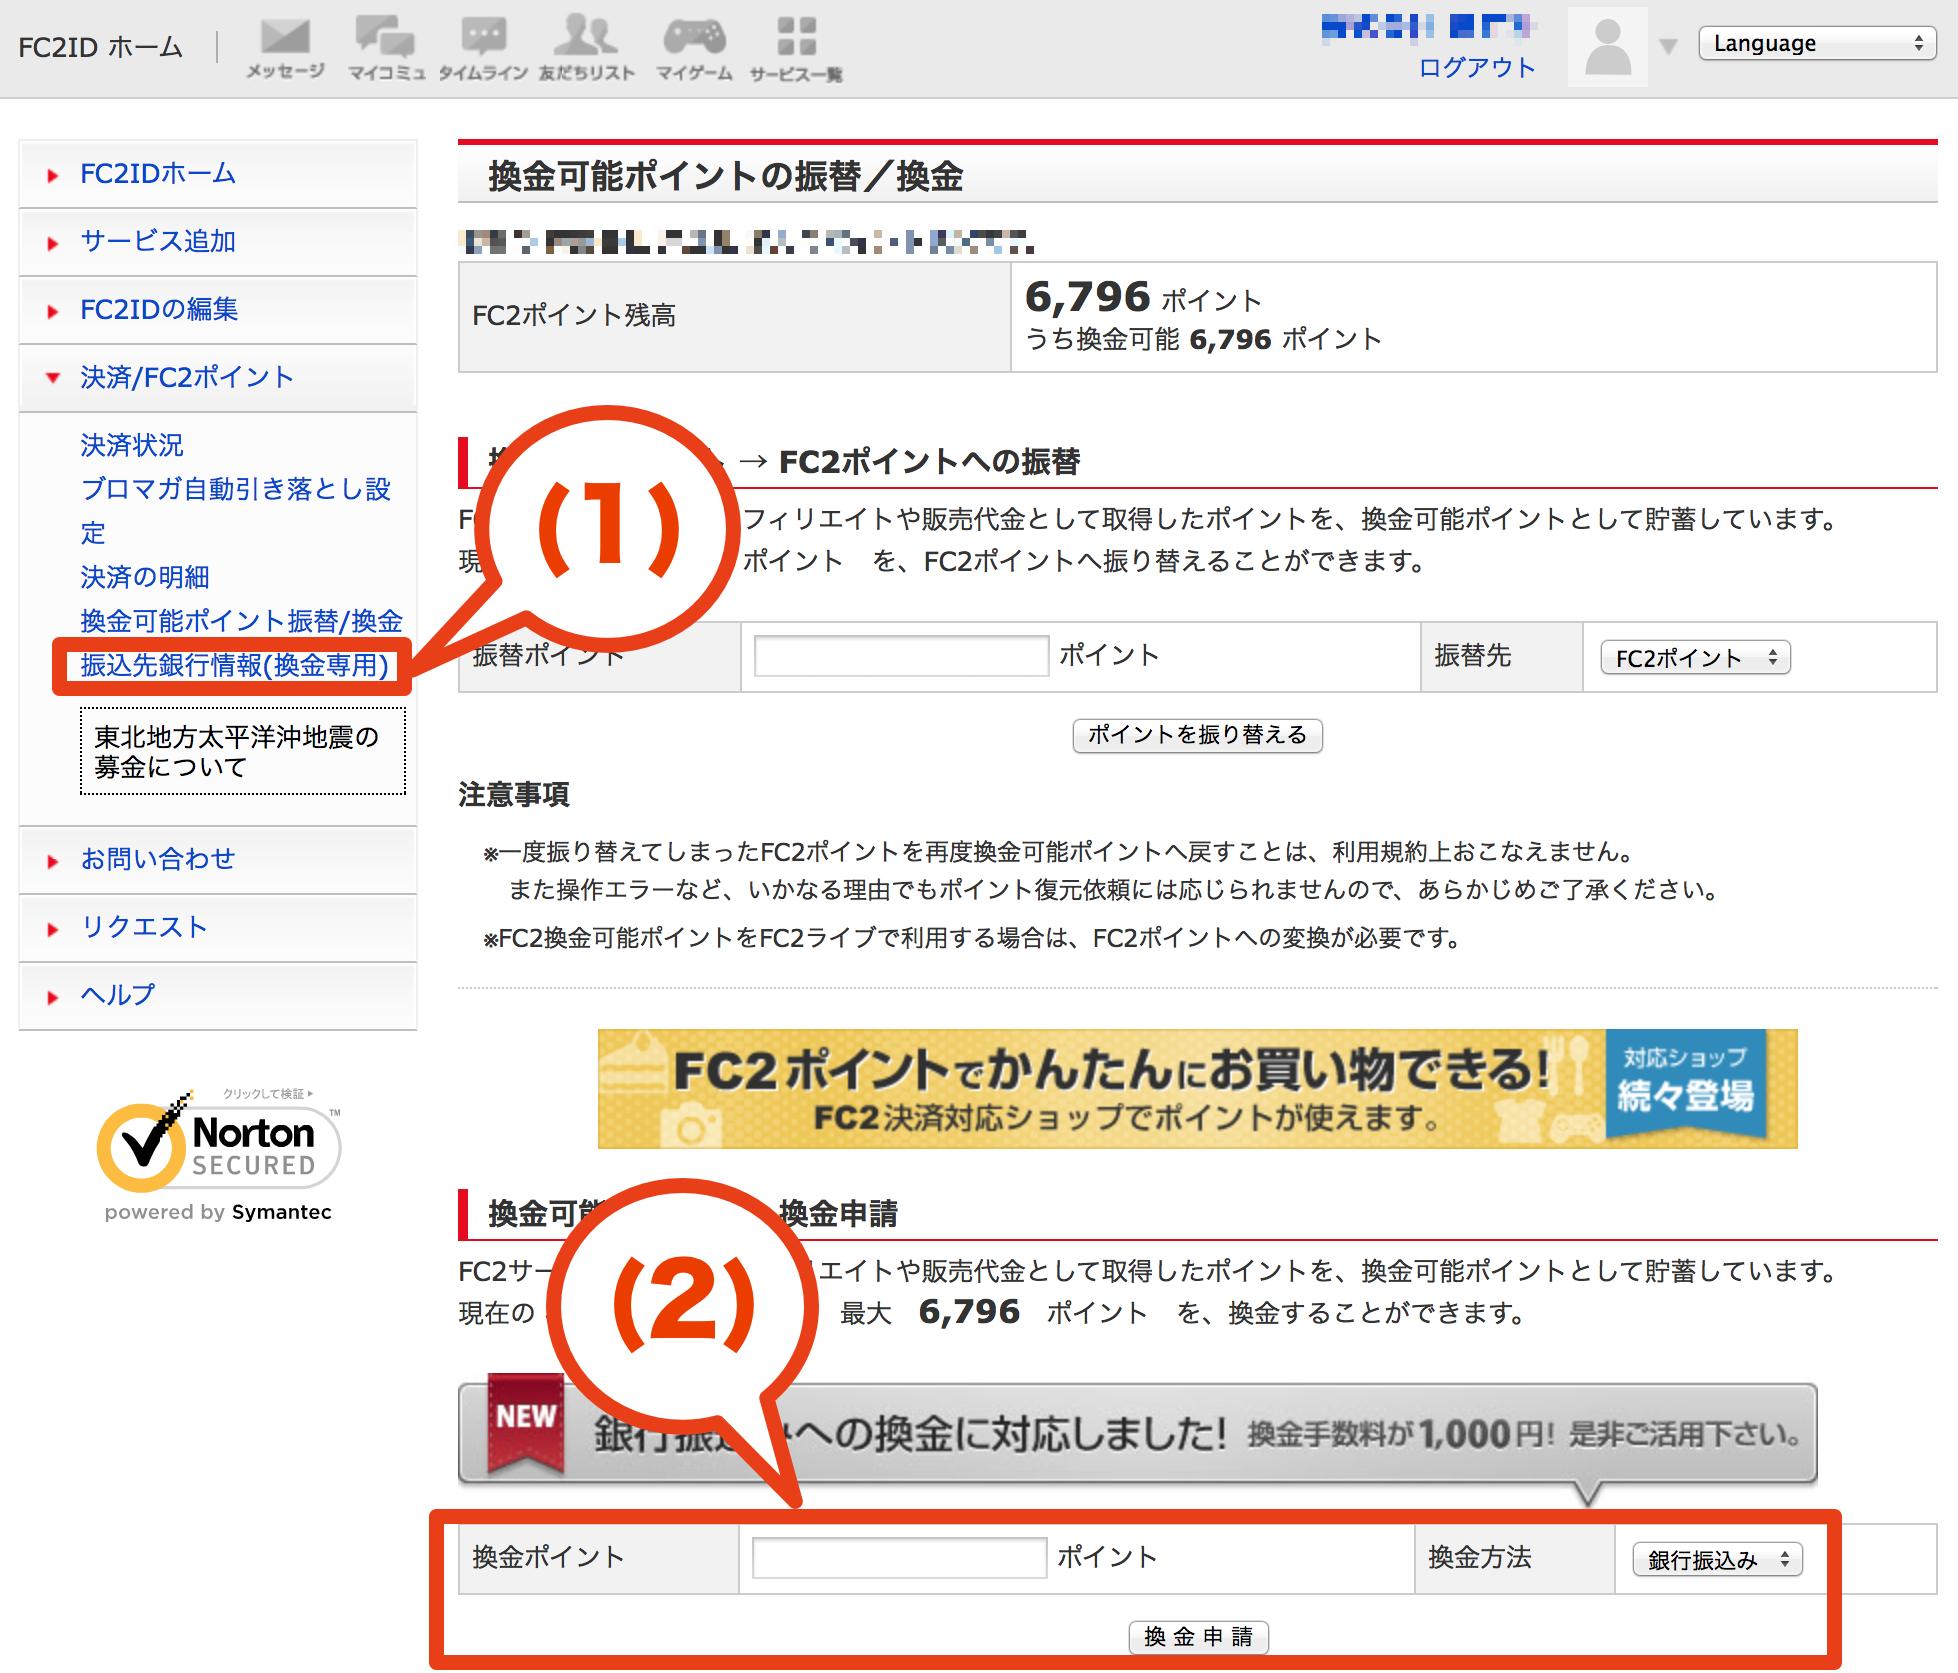 FC2コンテンツマーケットの報酬を換金する方法3